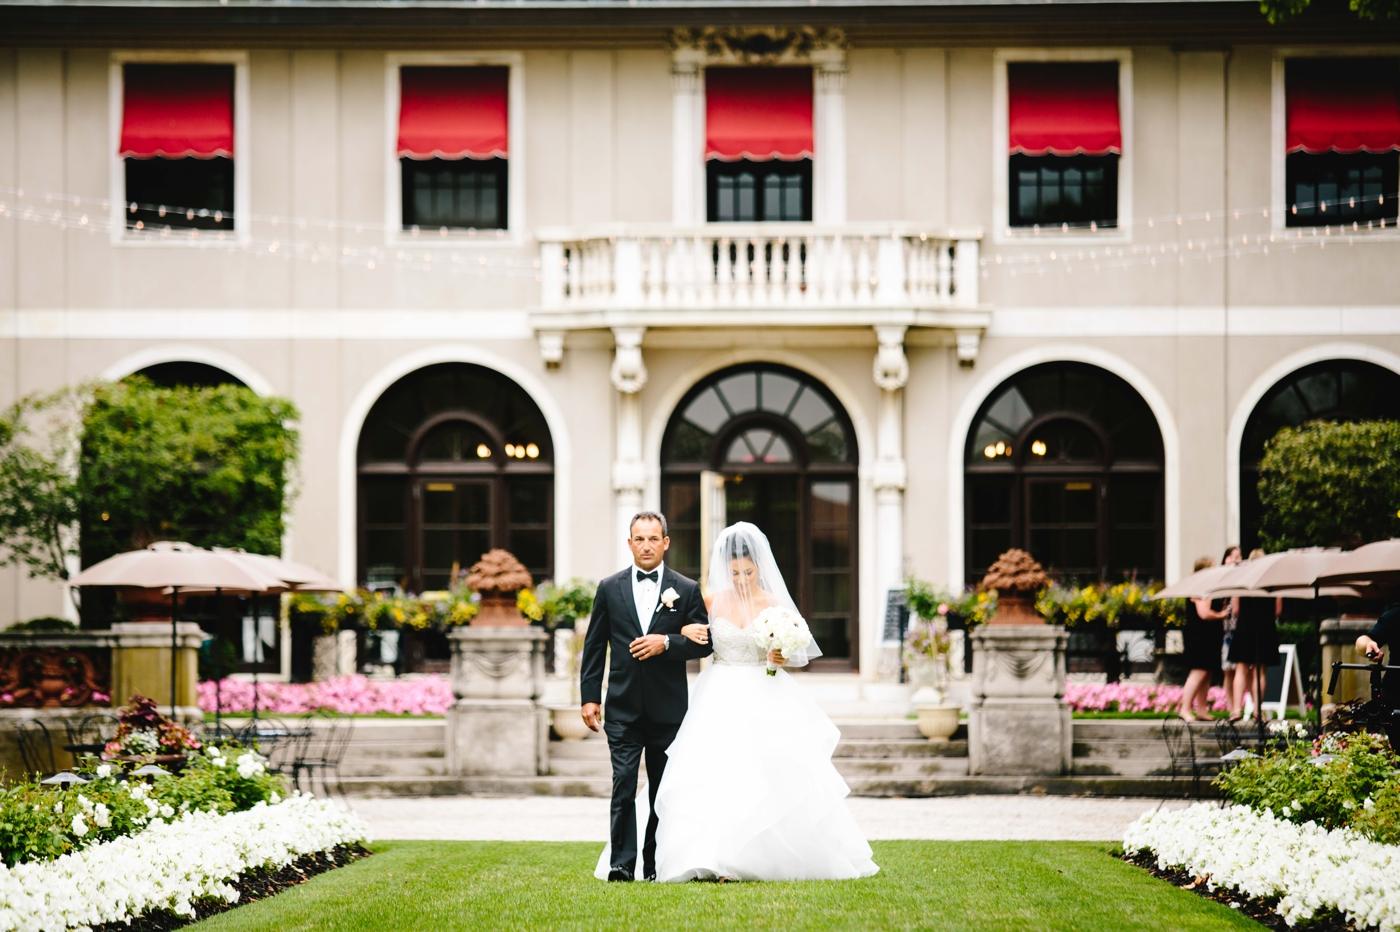 chicago-fine-art-wedding-photography-smeja21